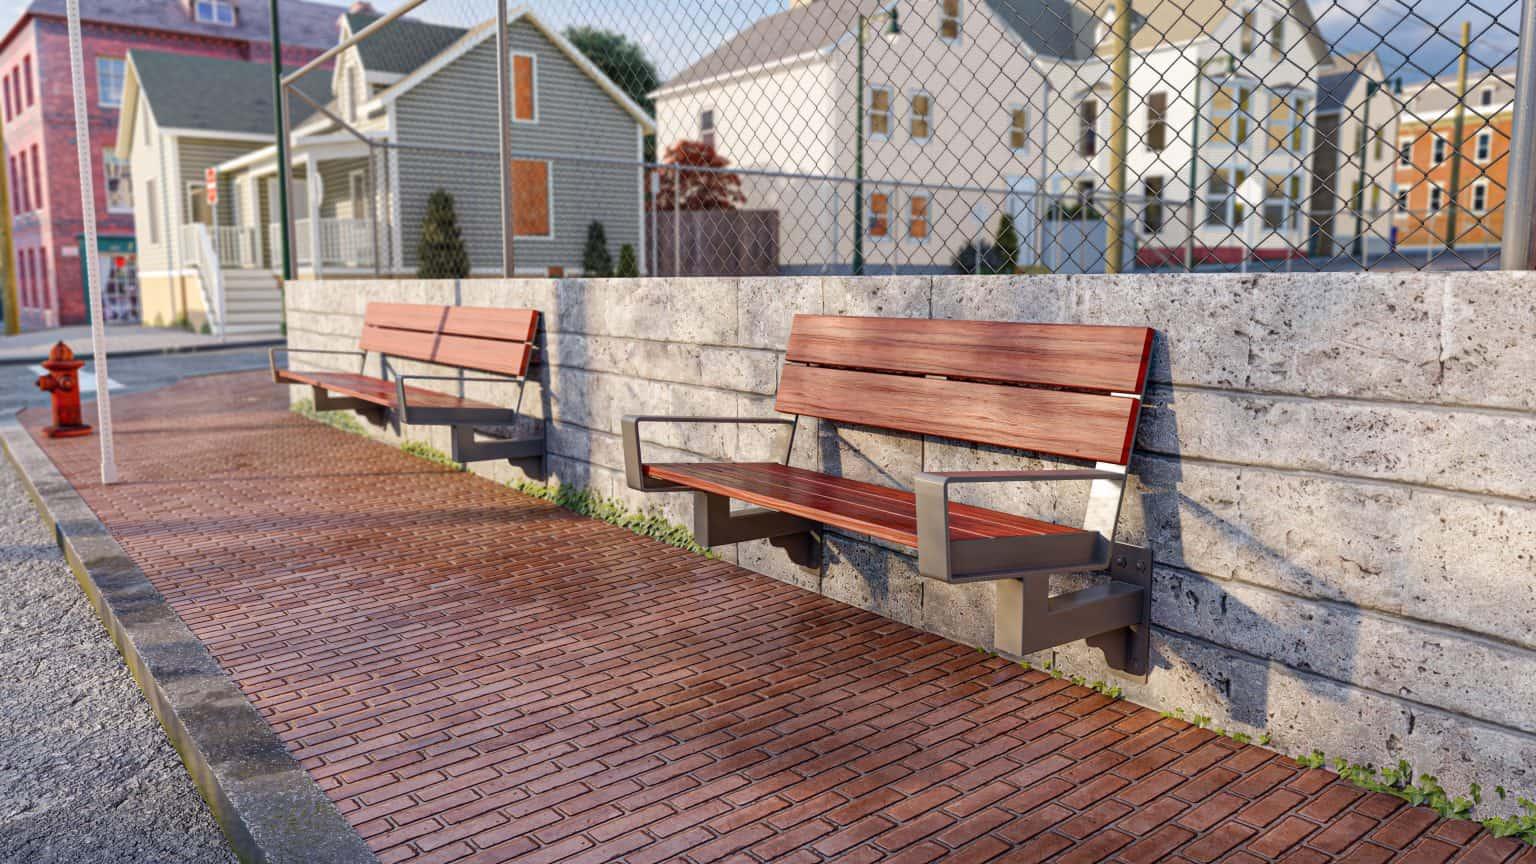 streetscape-furnishings_49643773331_o-1536x864